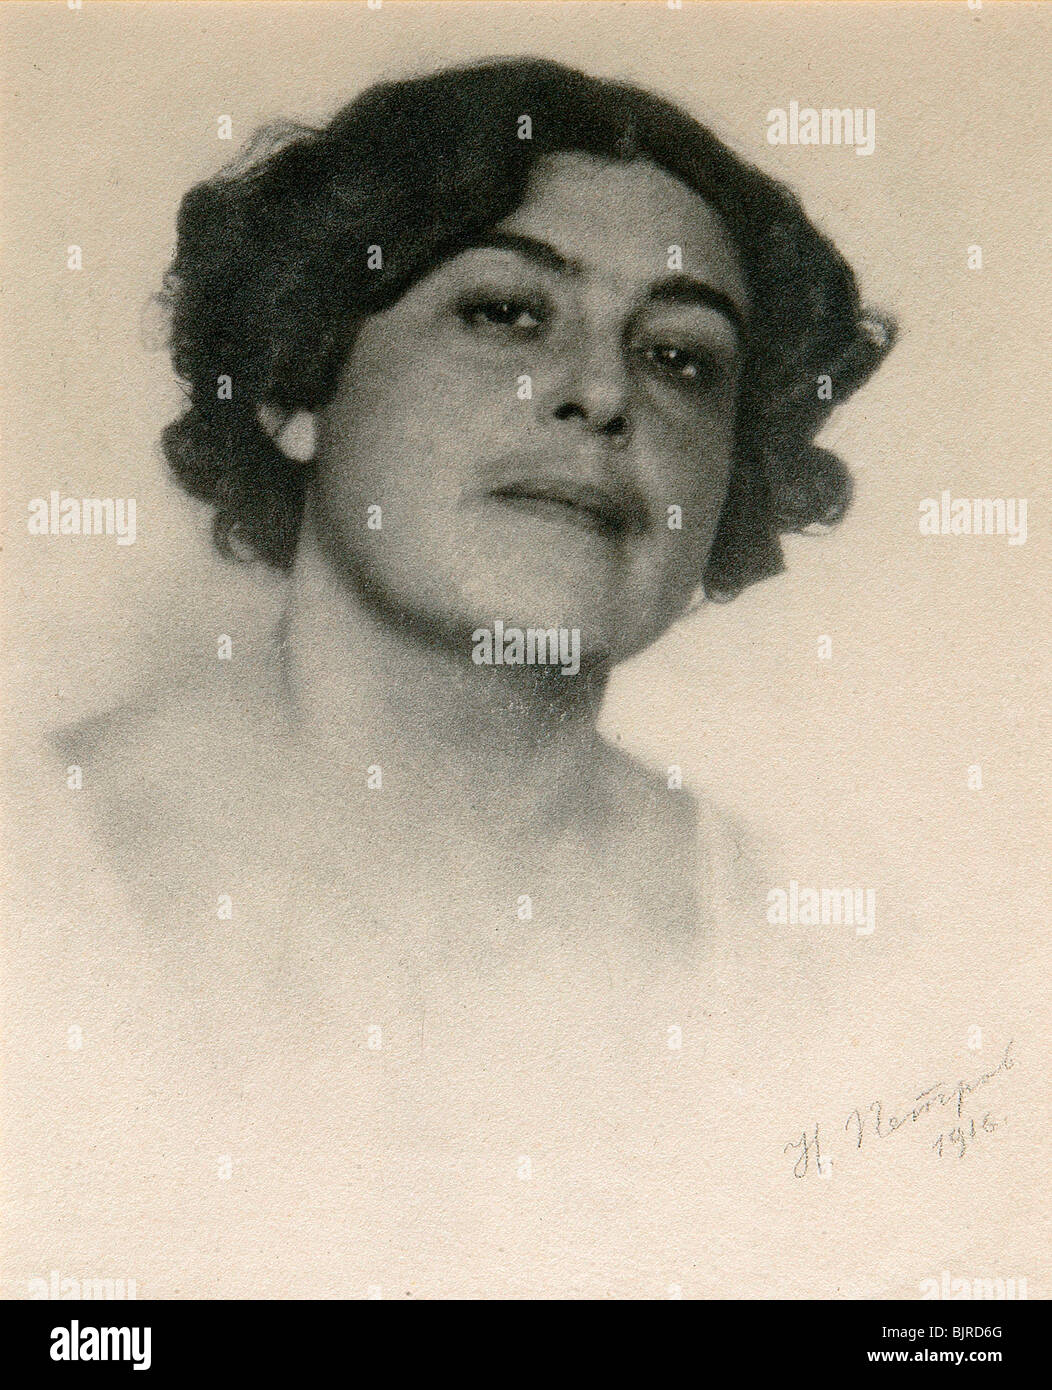 Portrait of the Russian actress Voronets, c1916. Artist: Nikolai Petrov - Stock Image